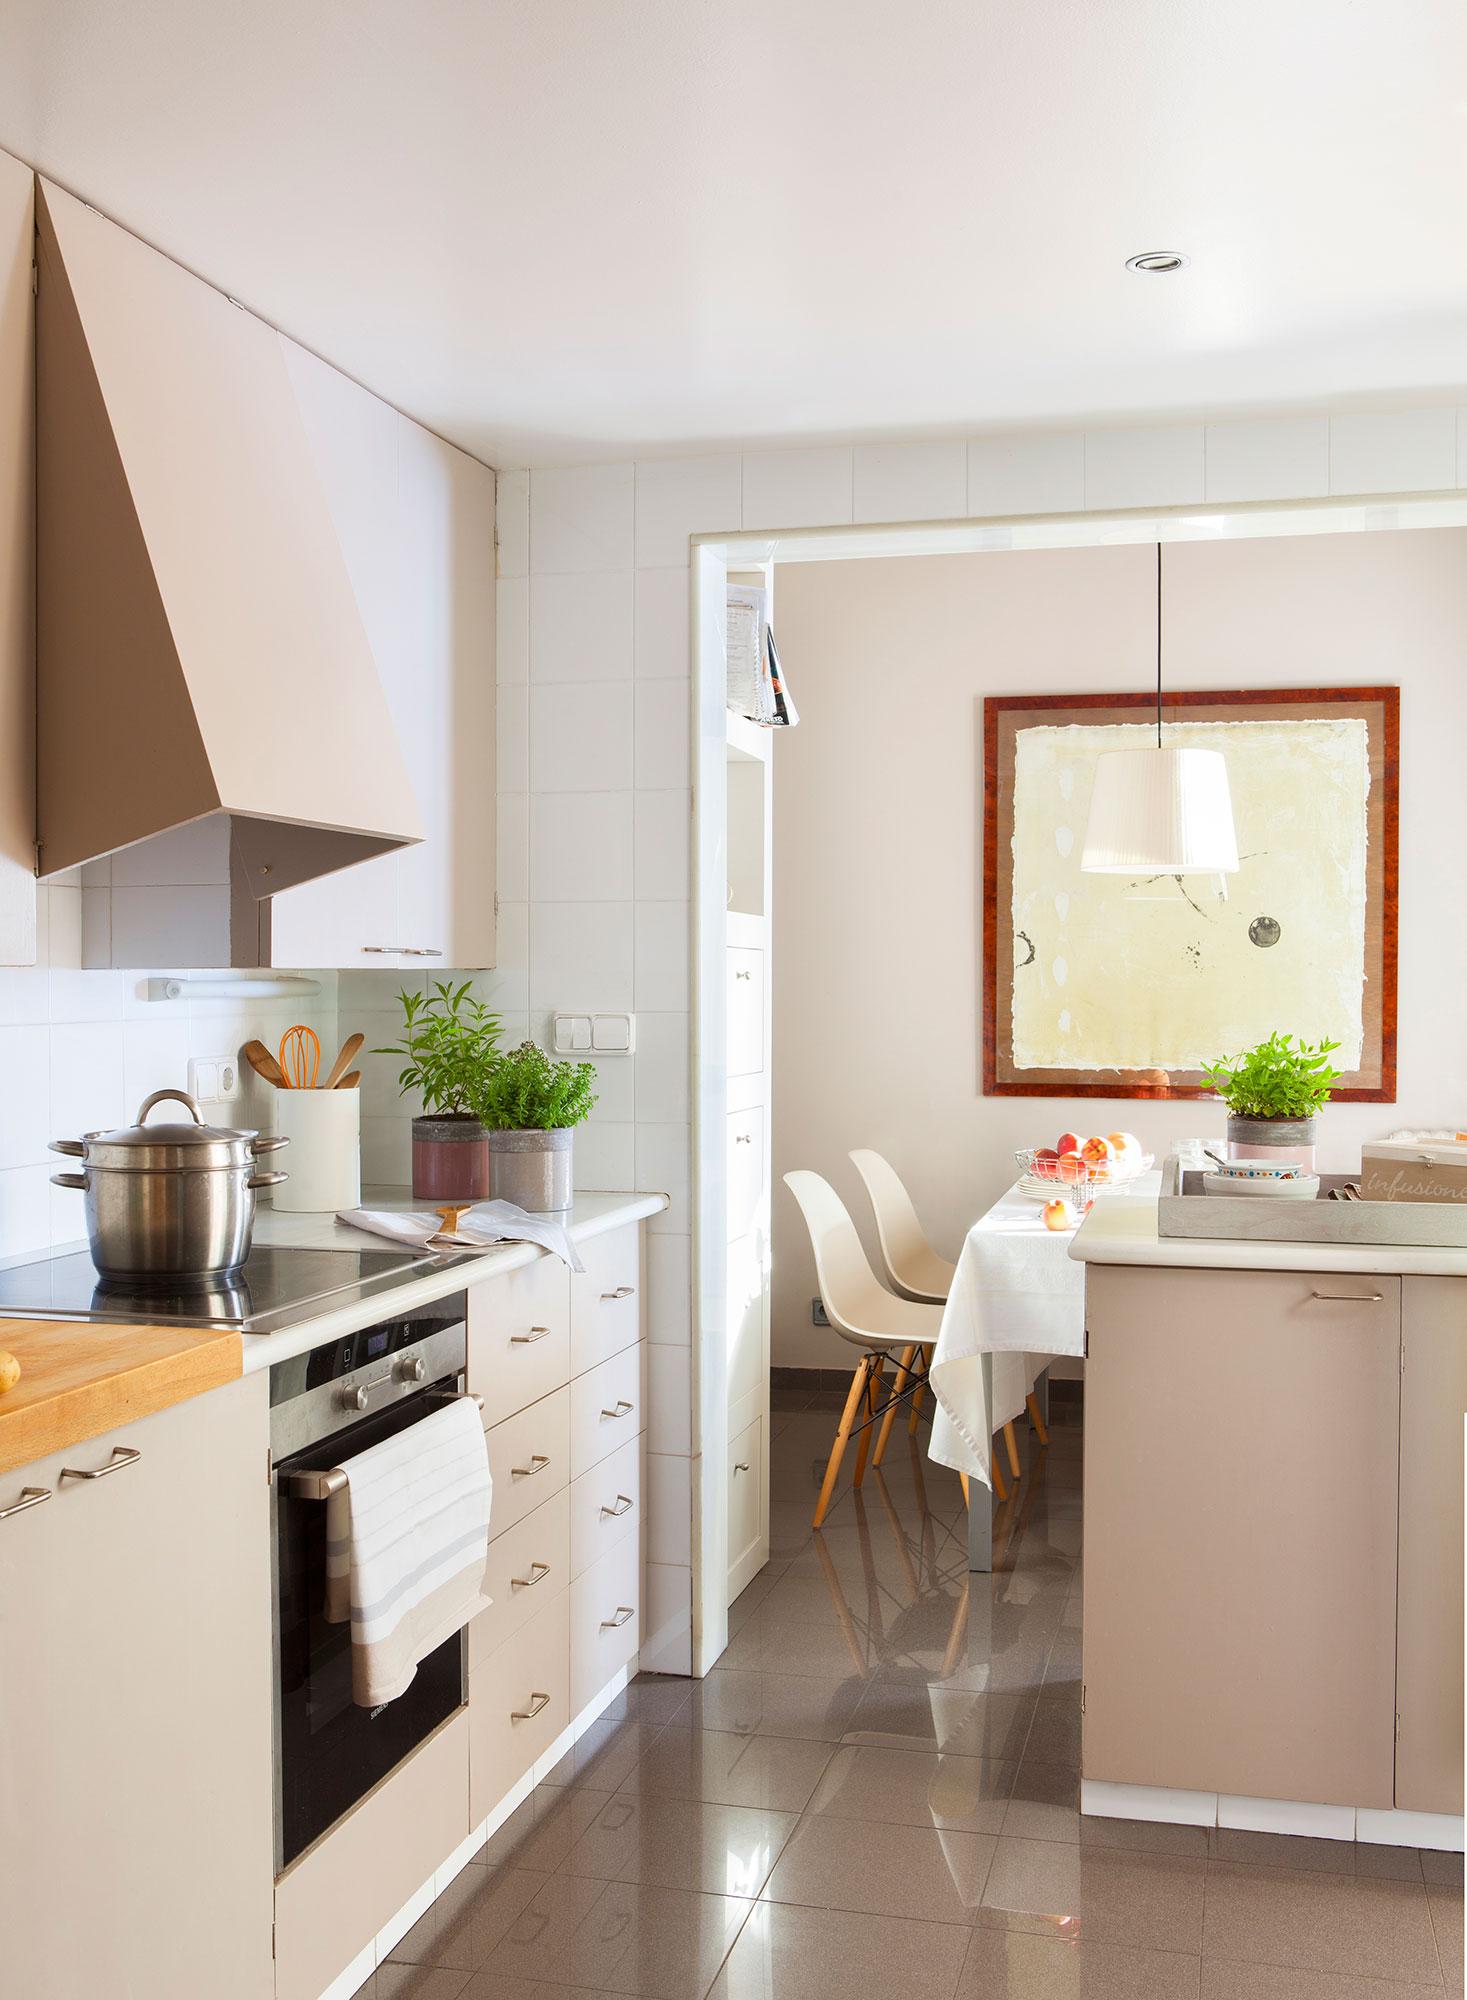 Renovar la cocina sin obras 10 reformas low cost for Remodelar bano sin obra